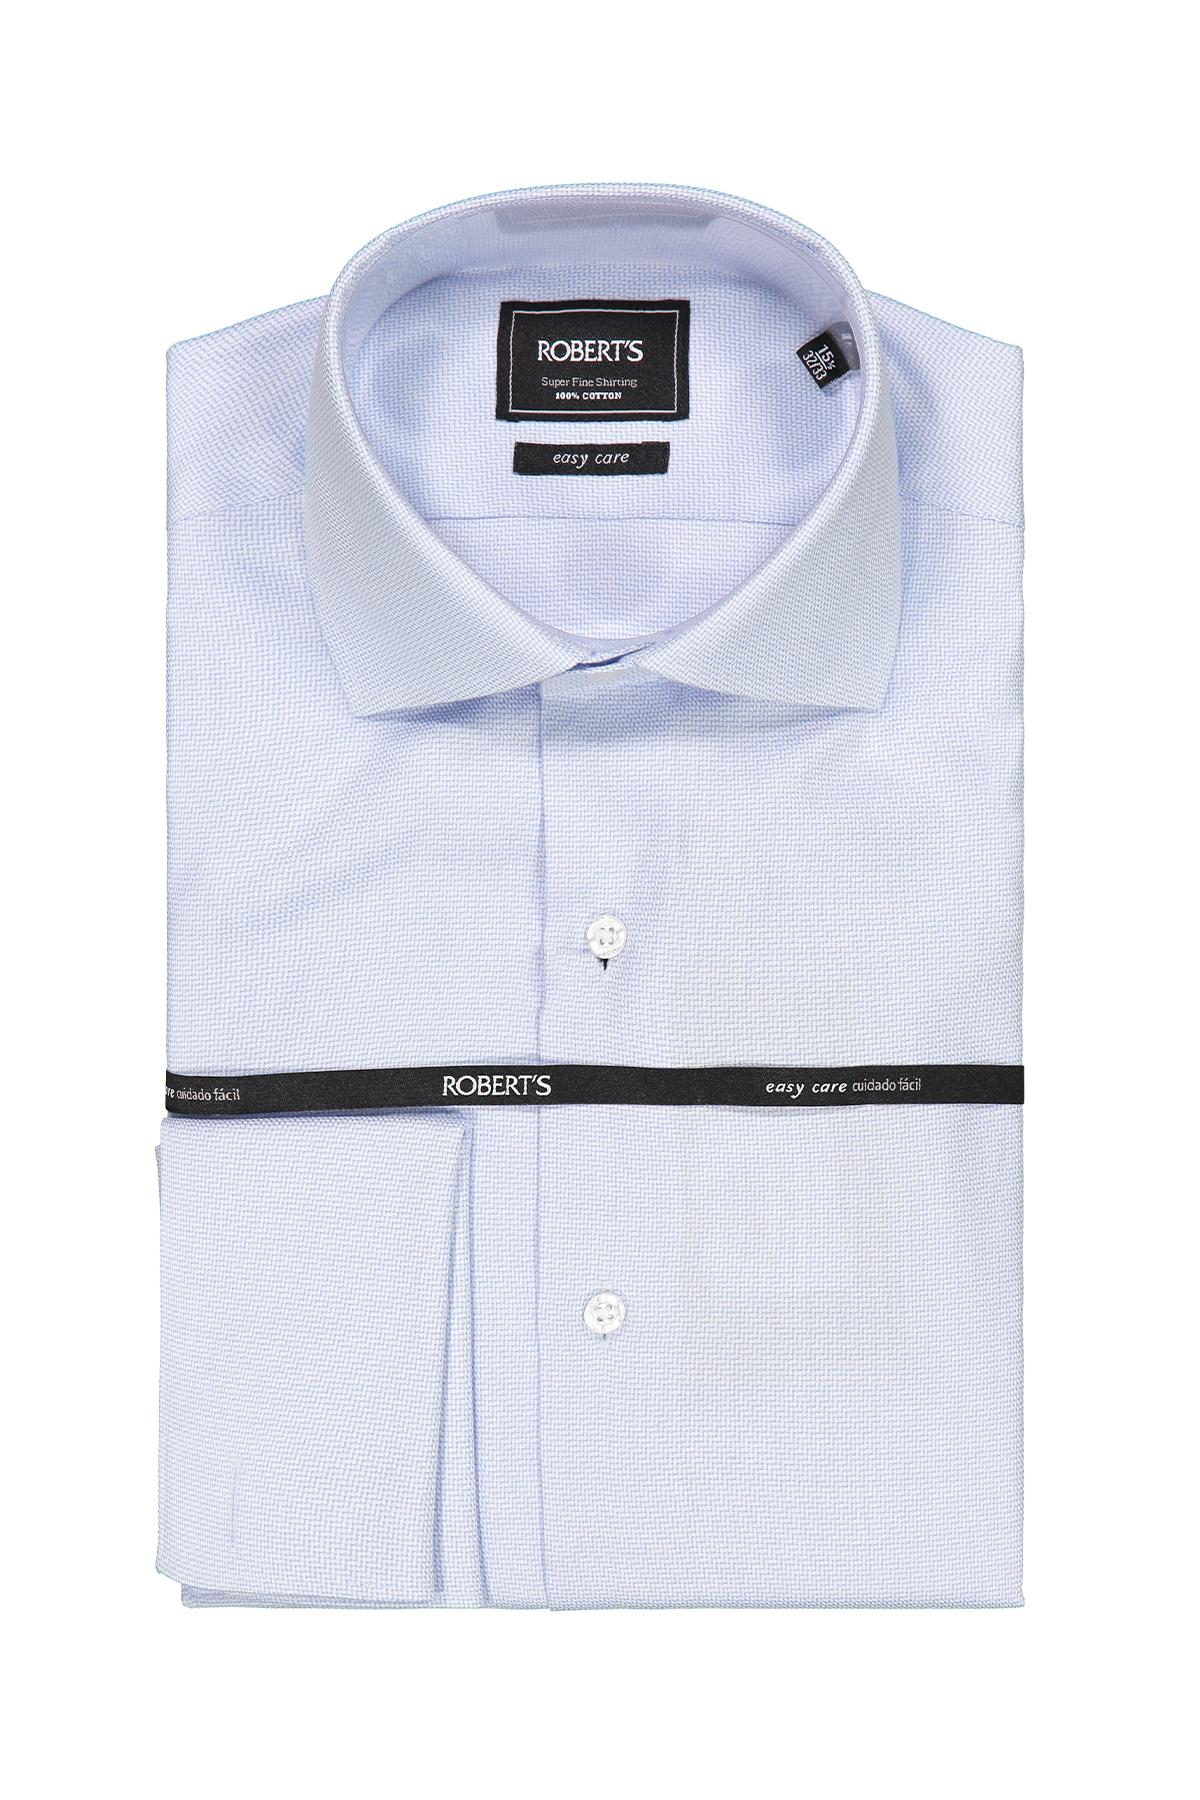 "Camisa Robert´s, slim fit, Easy Care"" blanca micro diseño celeste"